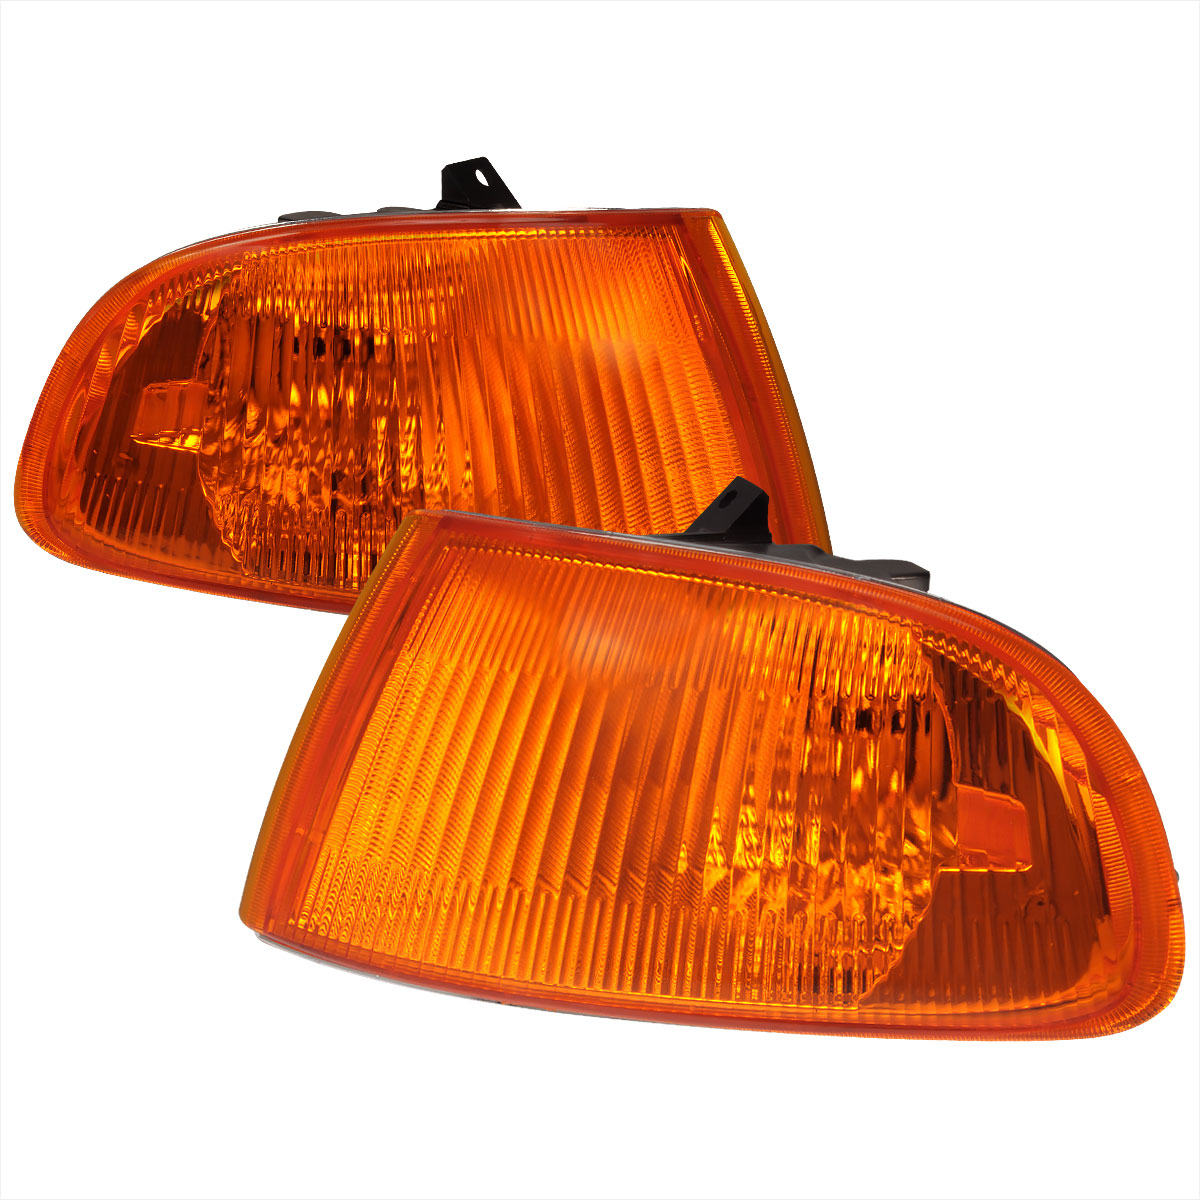 Spec-D Tuning LC-CV923AM-RS - Spec-D 92-95 Honda Civic 3dr Corner Lights (lc-cv923am-rs)